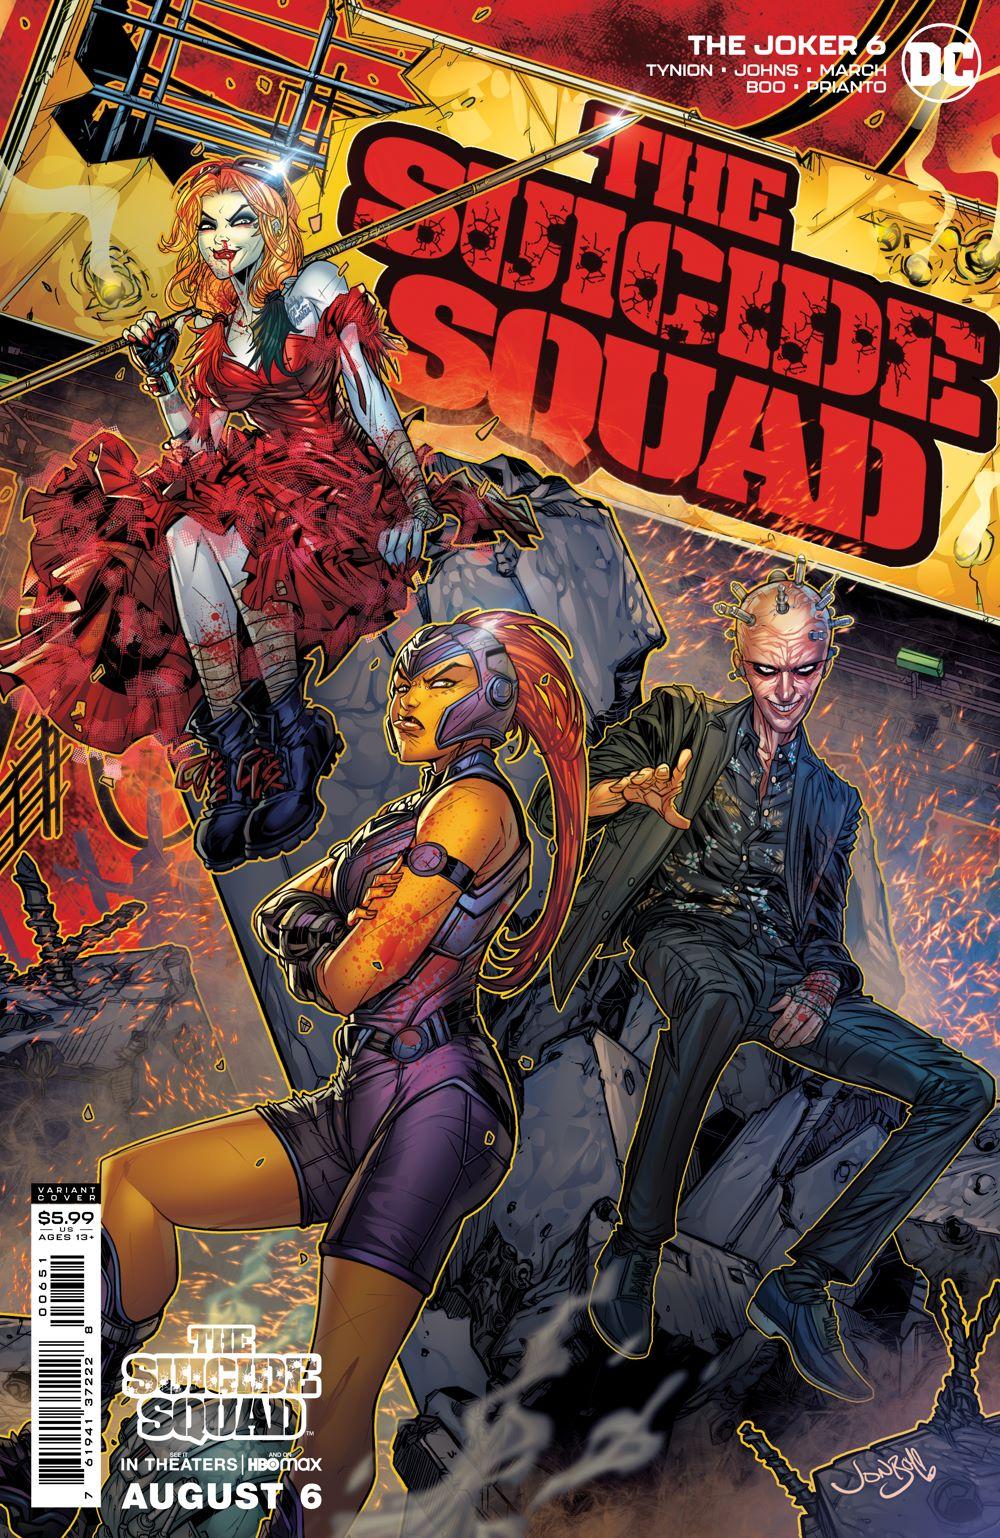 JKR_Cv6_SSQUADMOVIE_var_00651 DC Comics August 2021 Solicitations